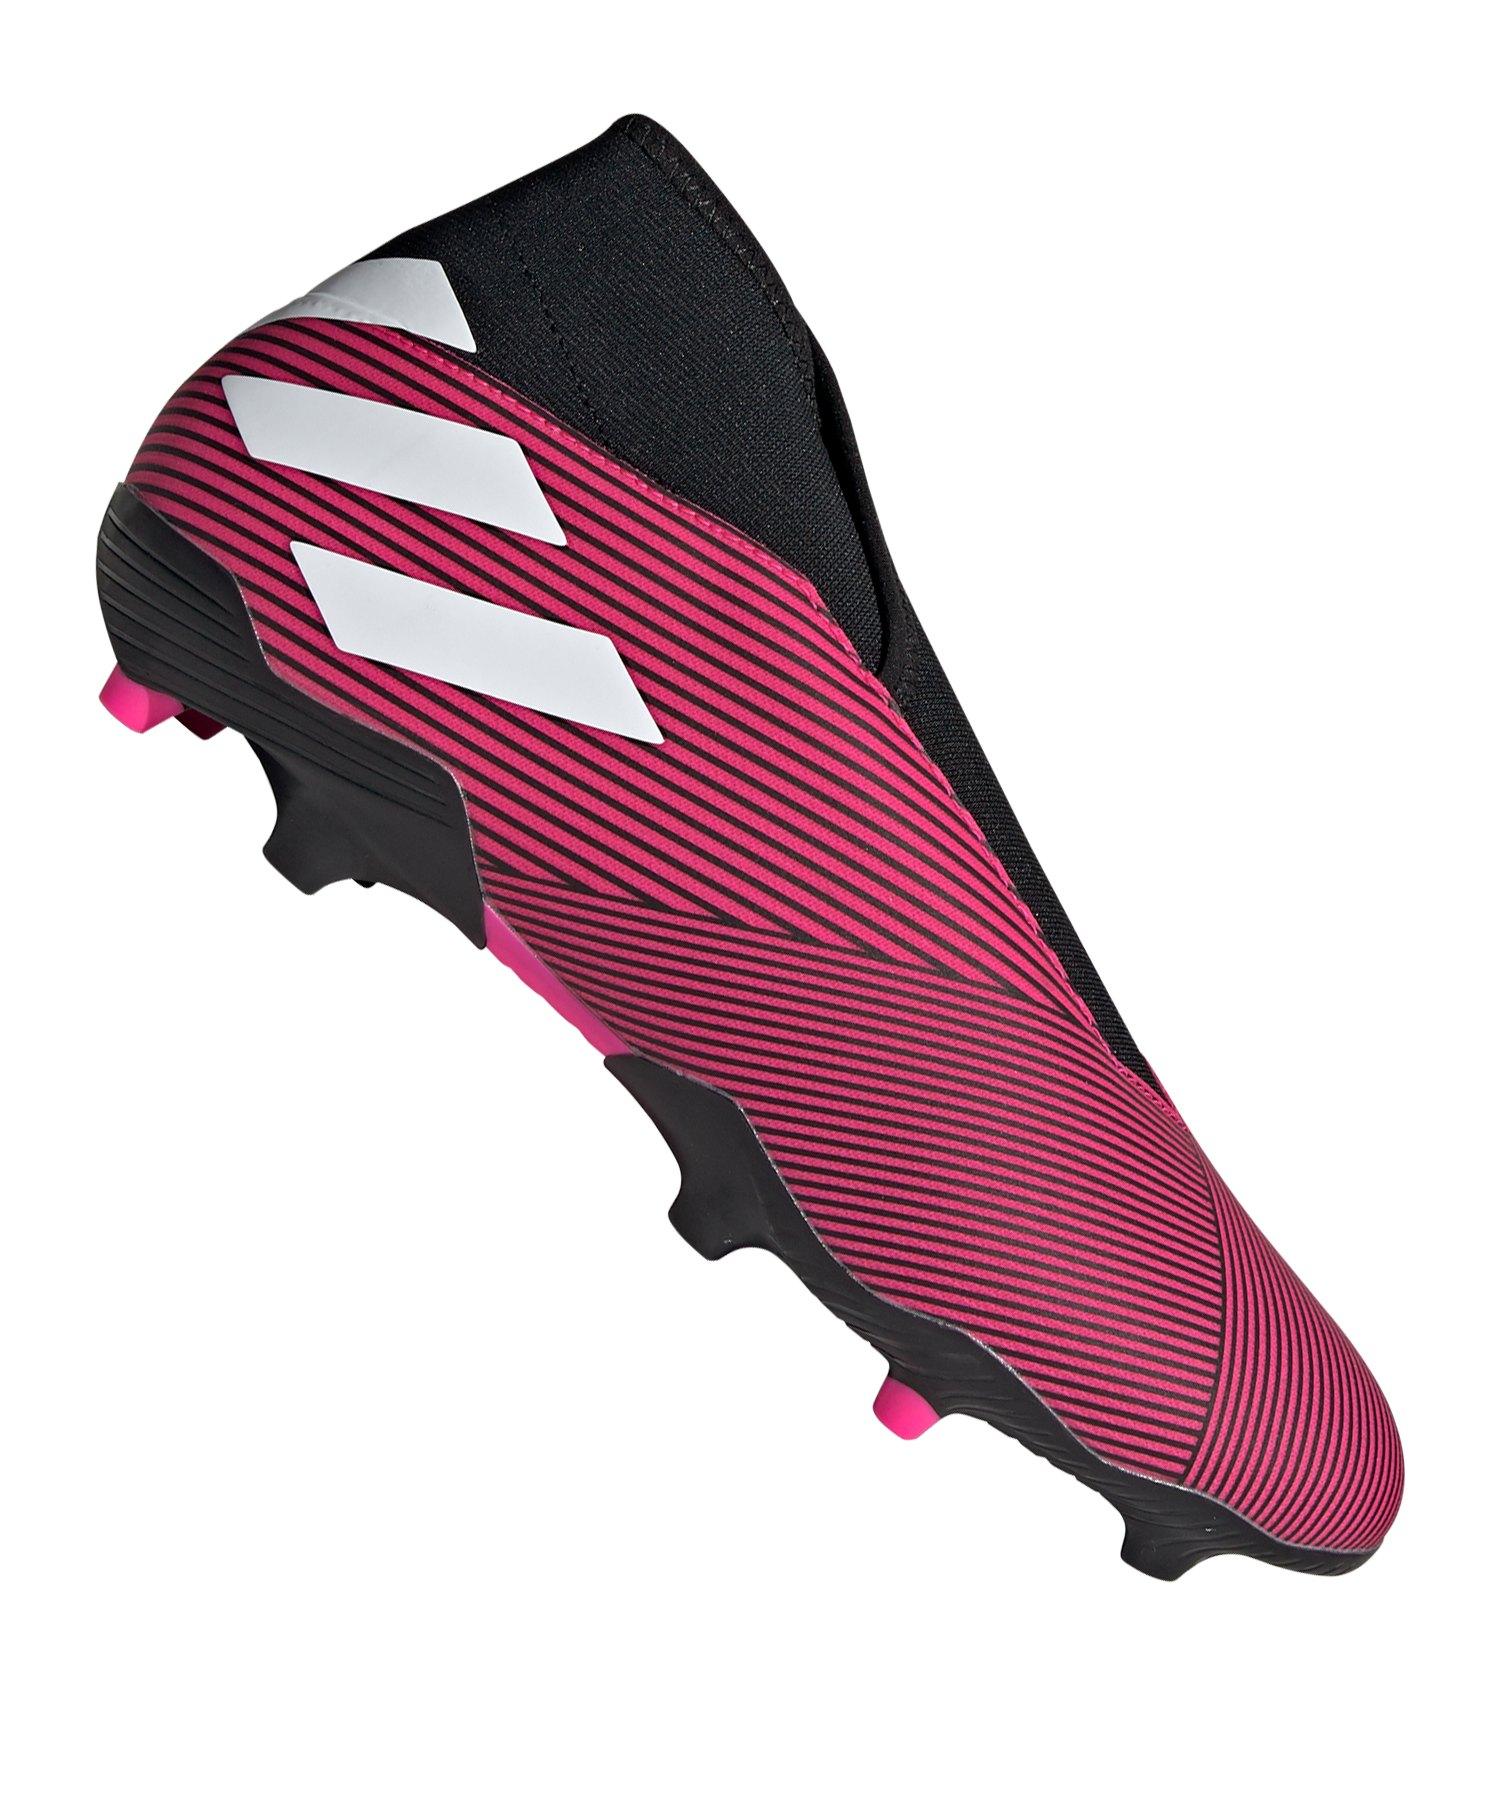 adidas NEMEZIZ 19.3 LL FG Pink - pink